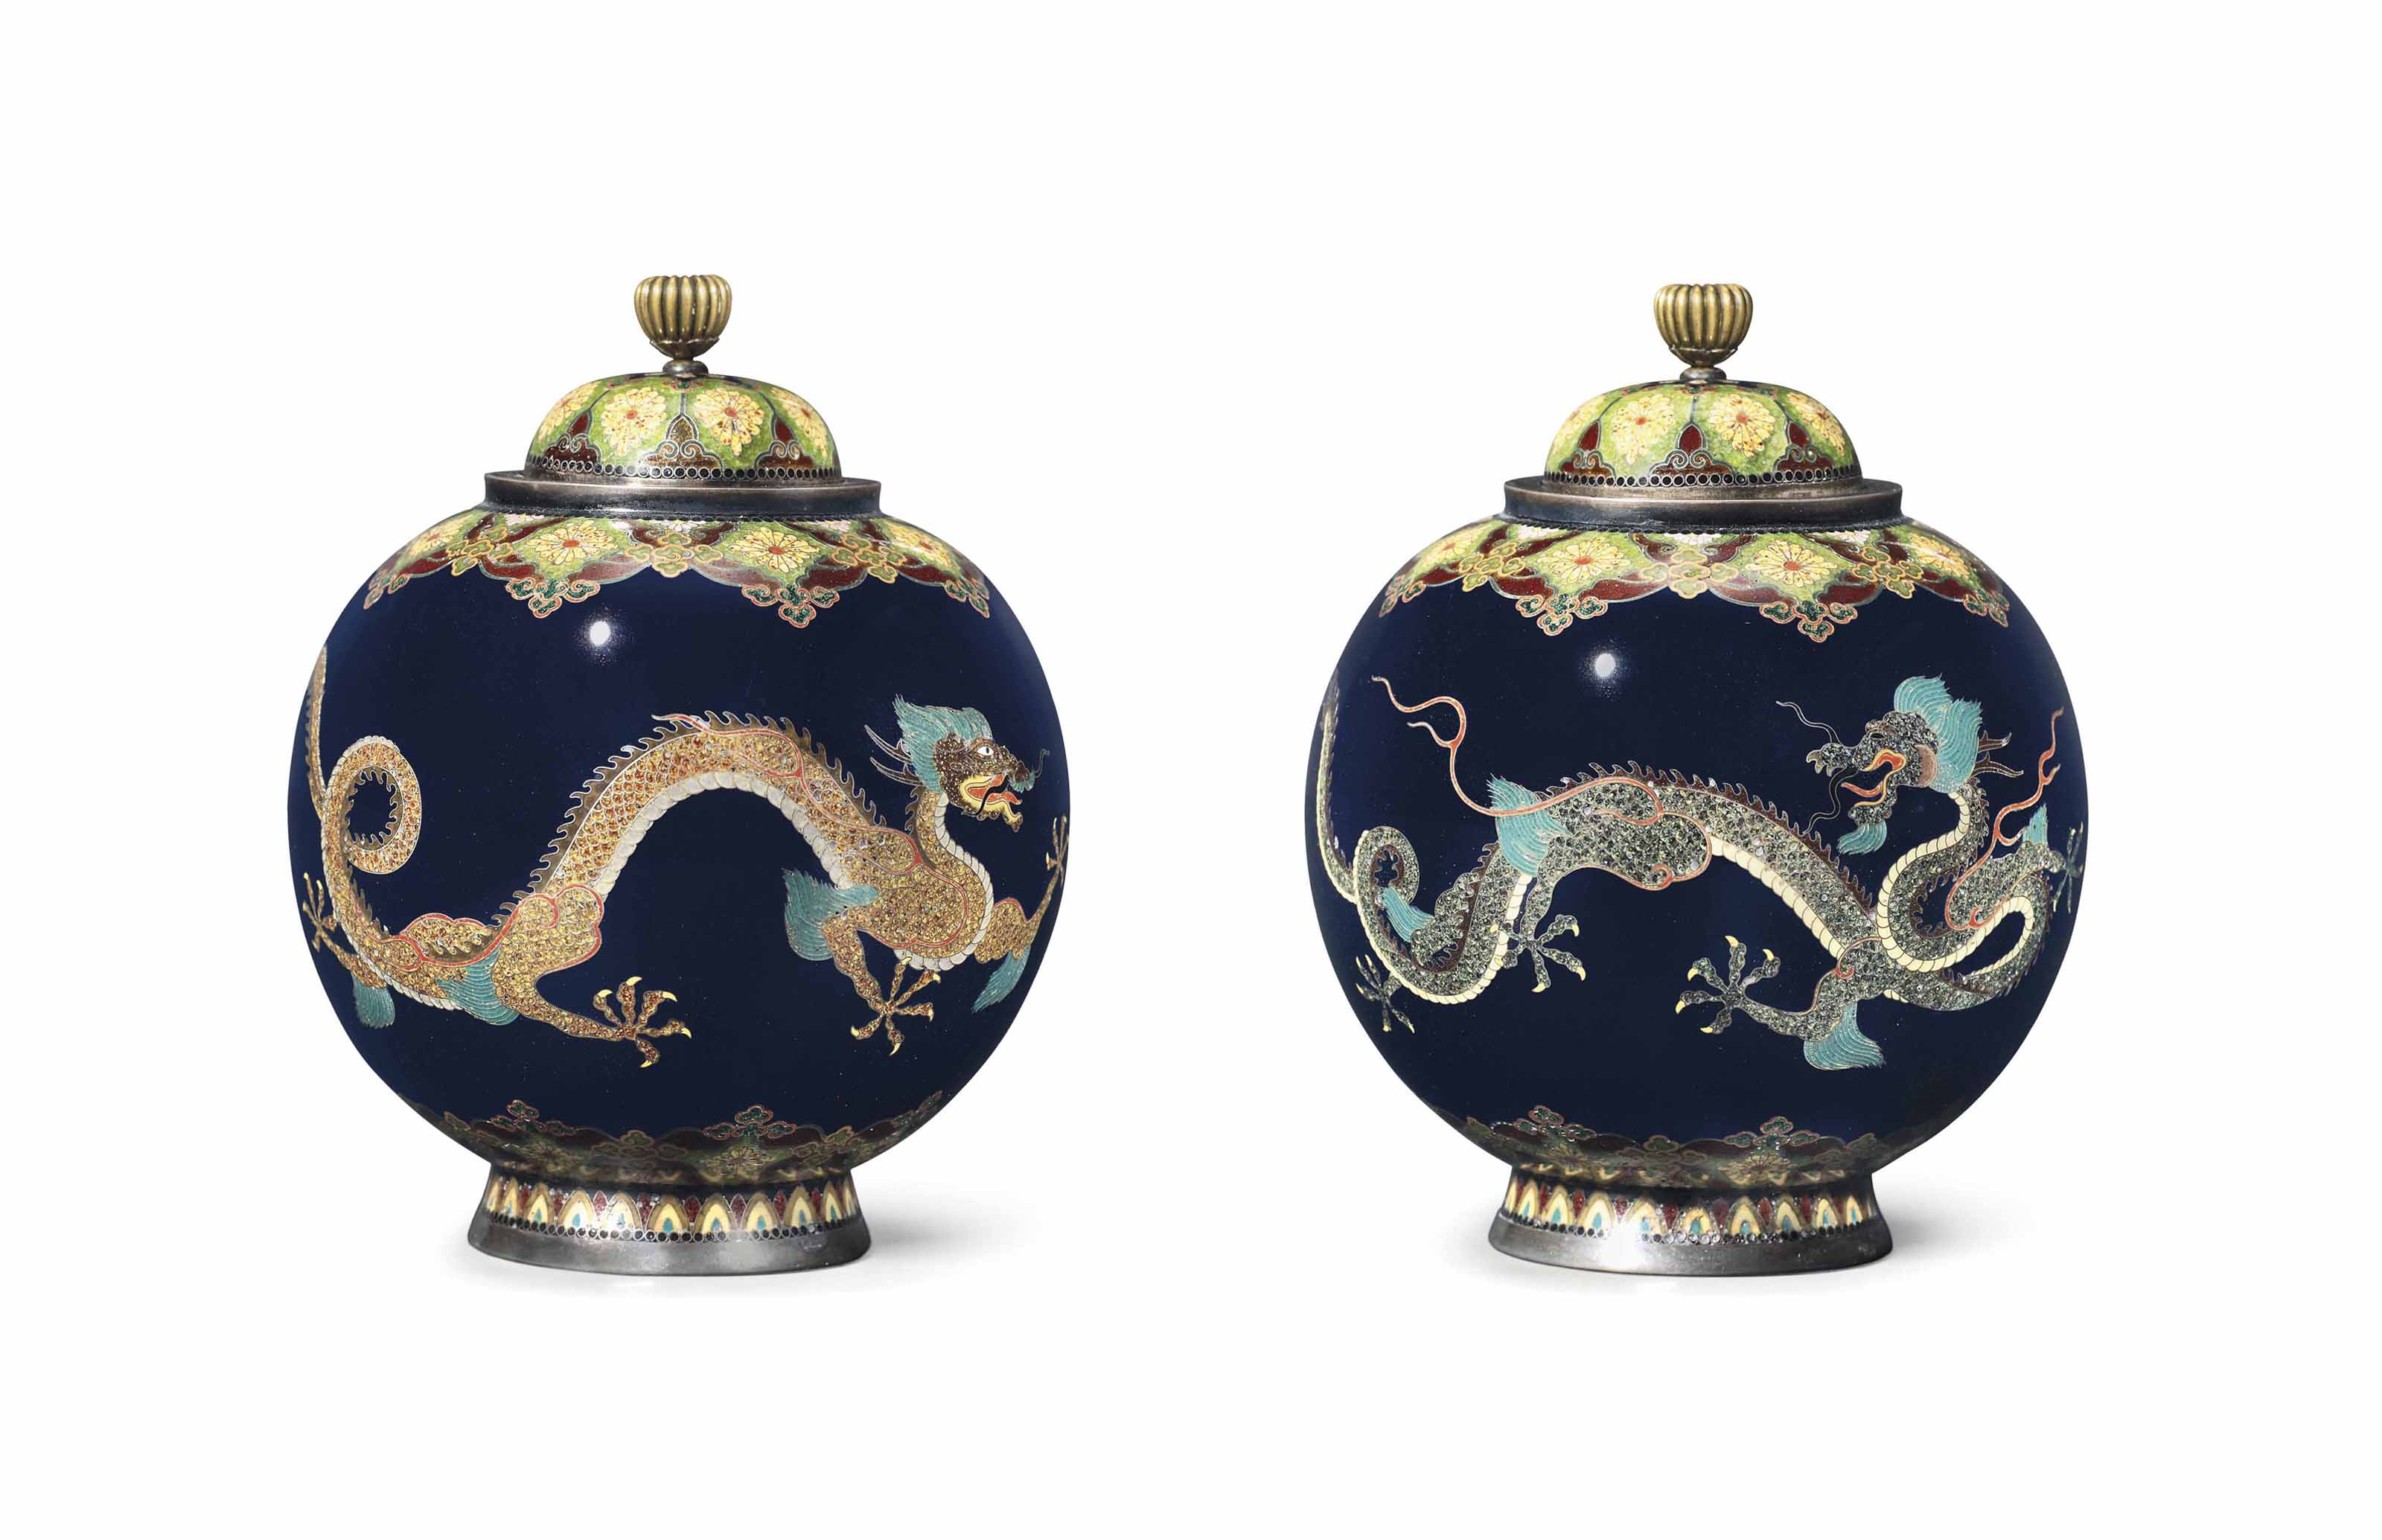 A Cloisonné Vase and Cover